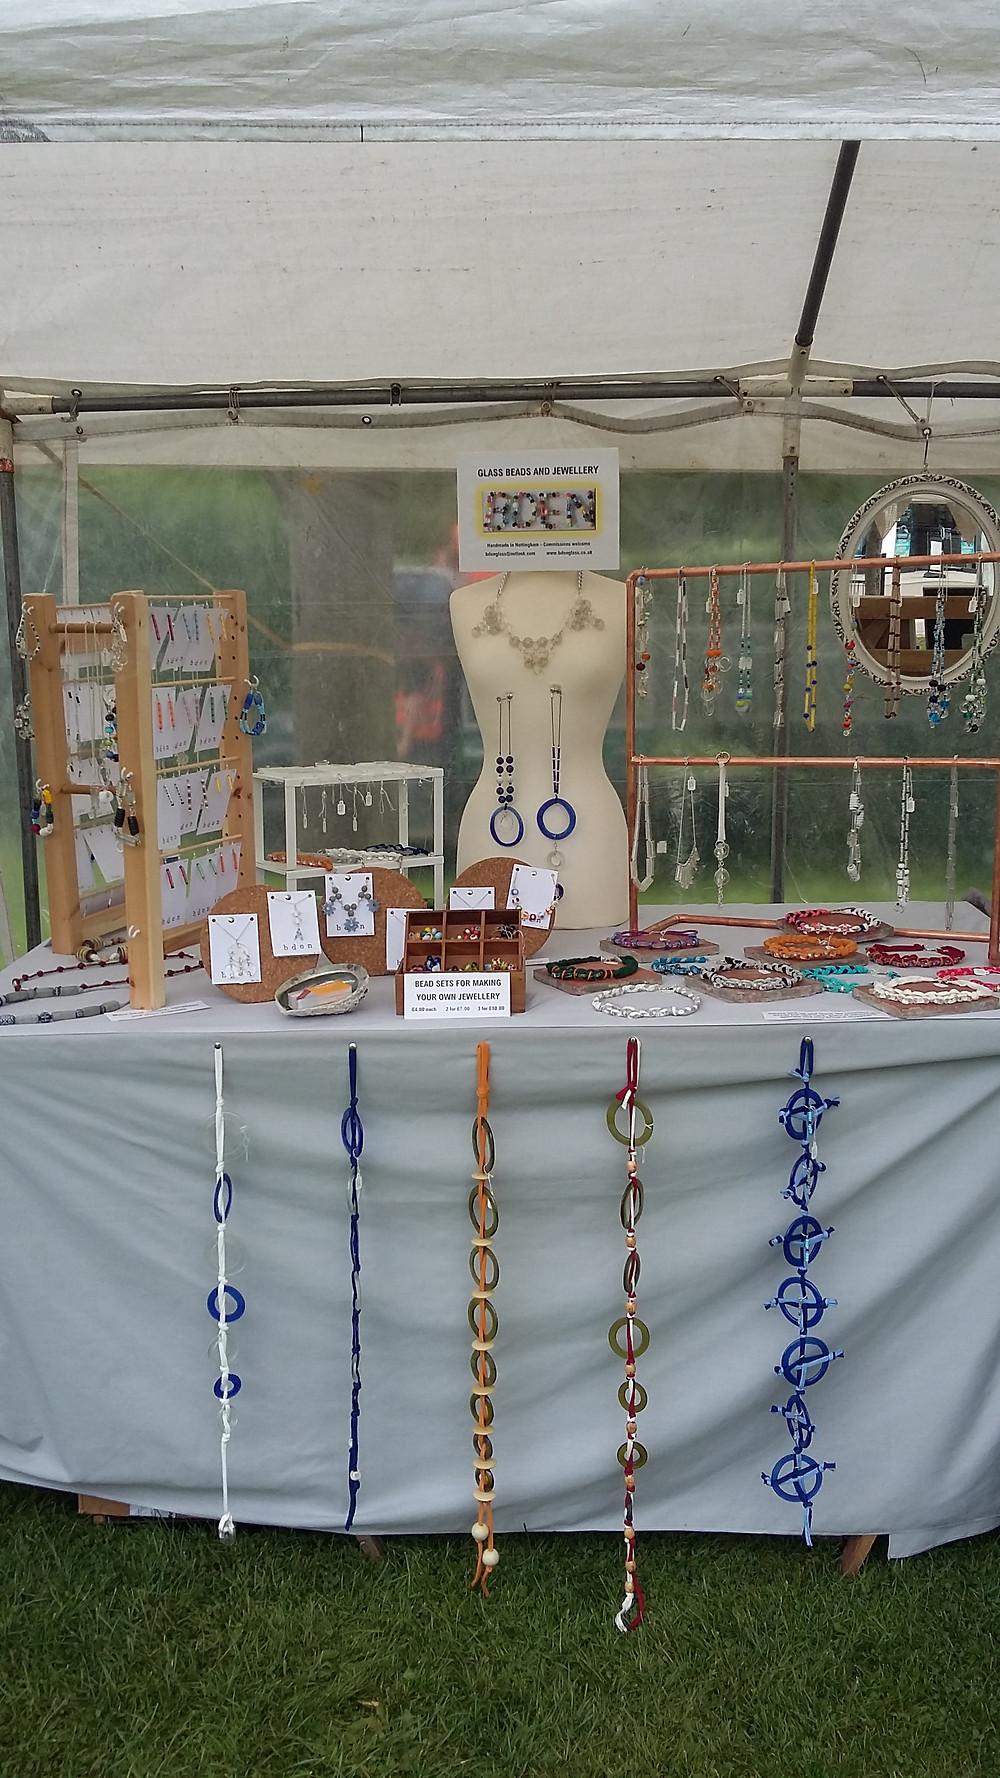 The West Bridgford Art and Craft Fair